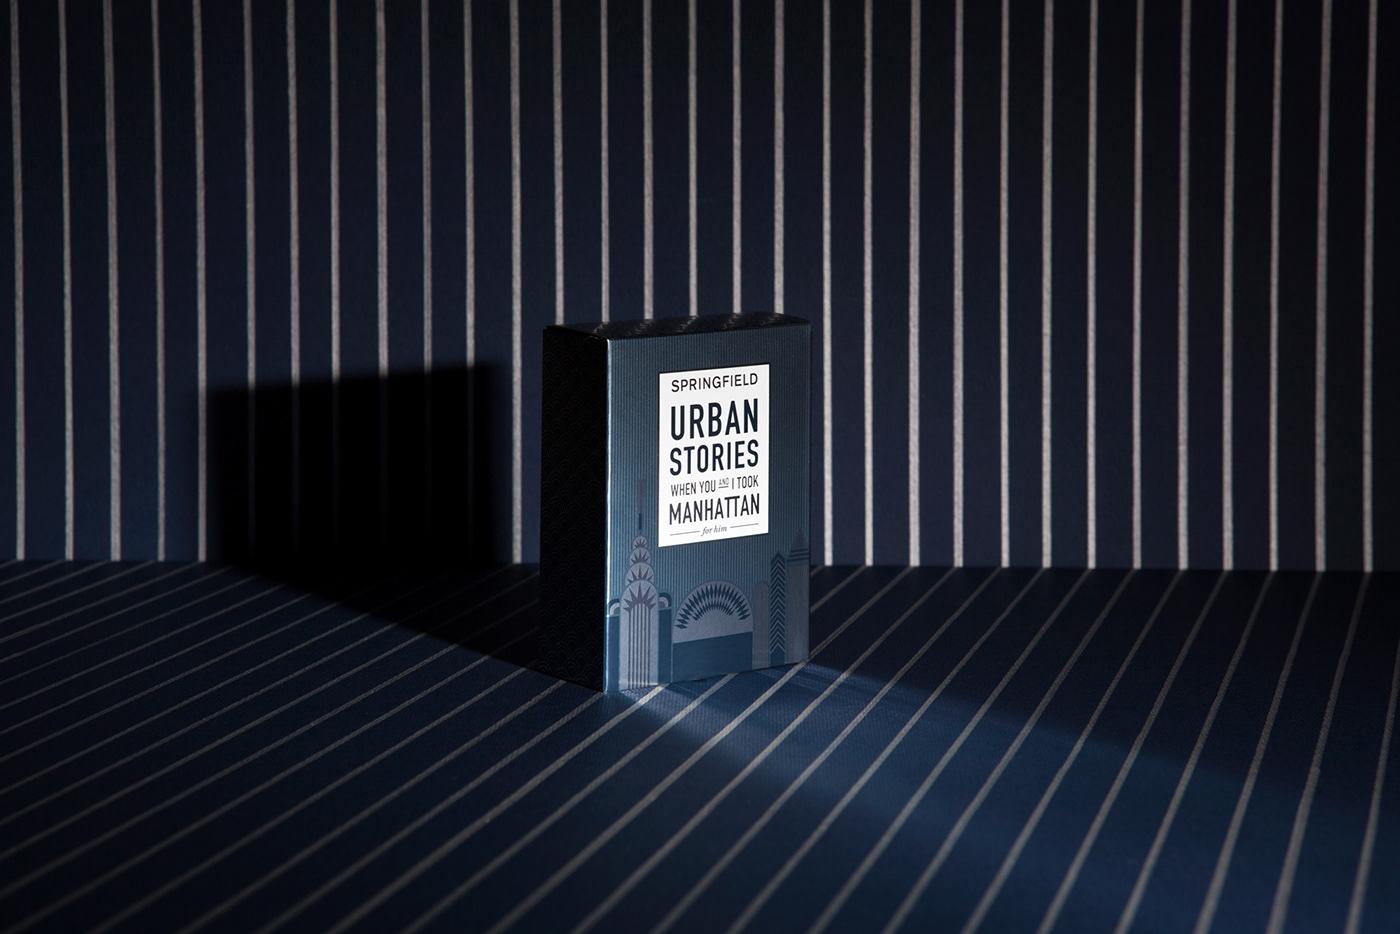 Packaging perfume art deco pattern ILLUSTRATION  glamorous shinny Springfield puig graphic design